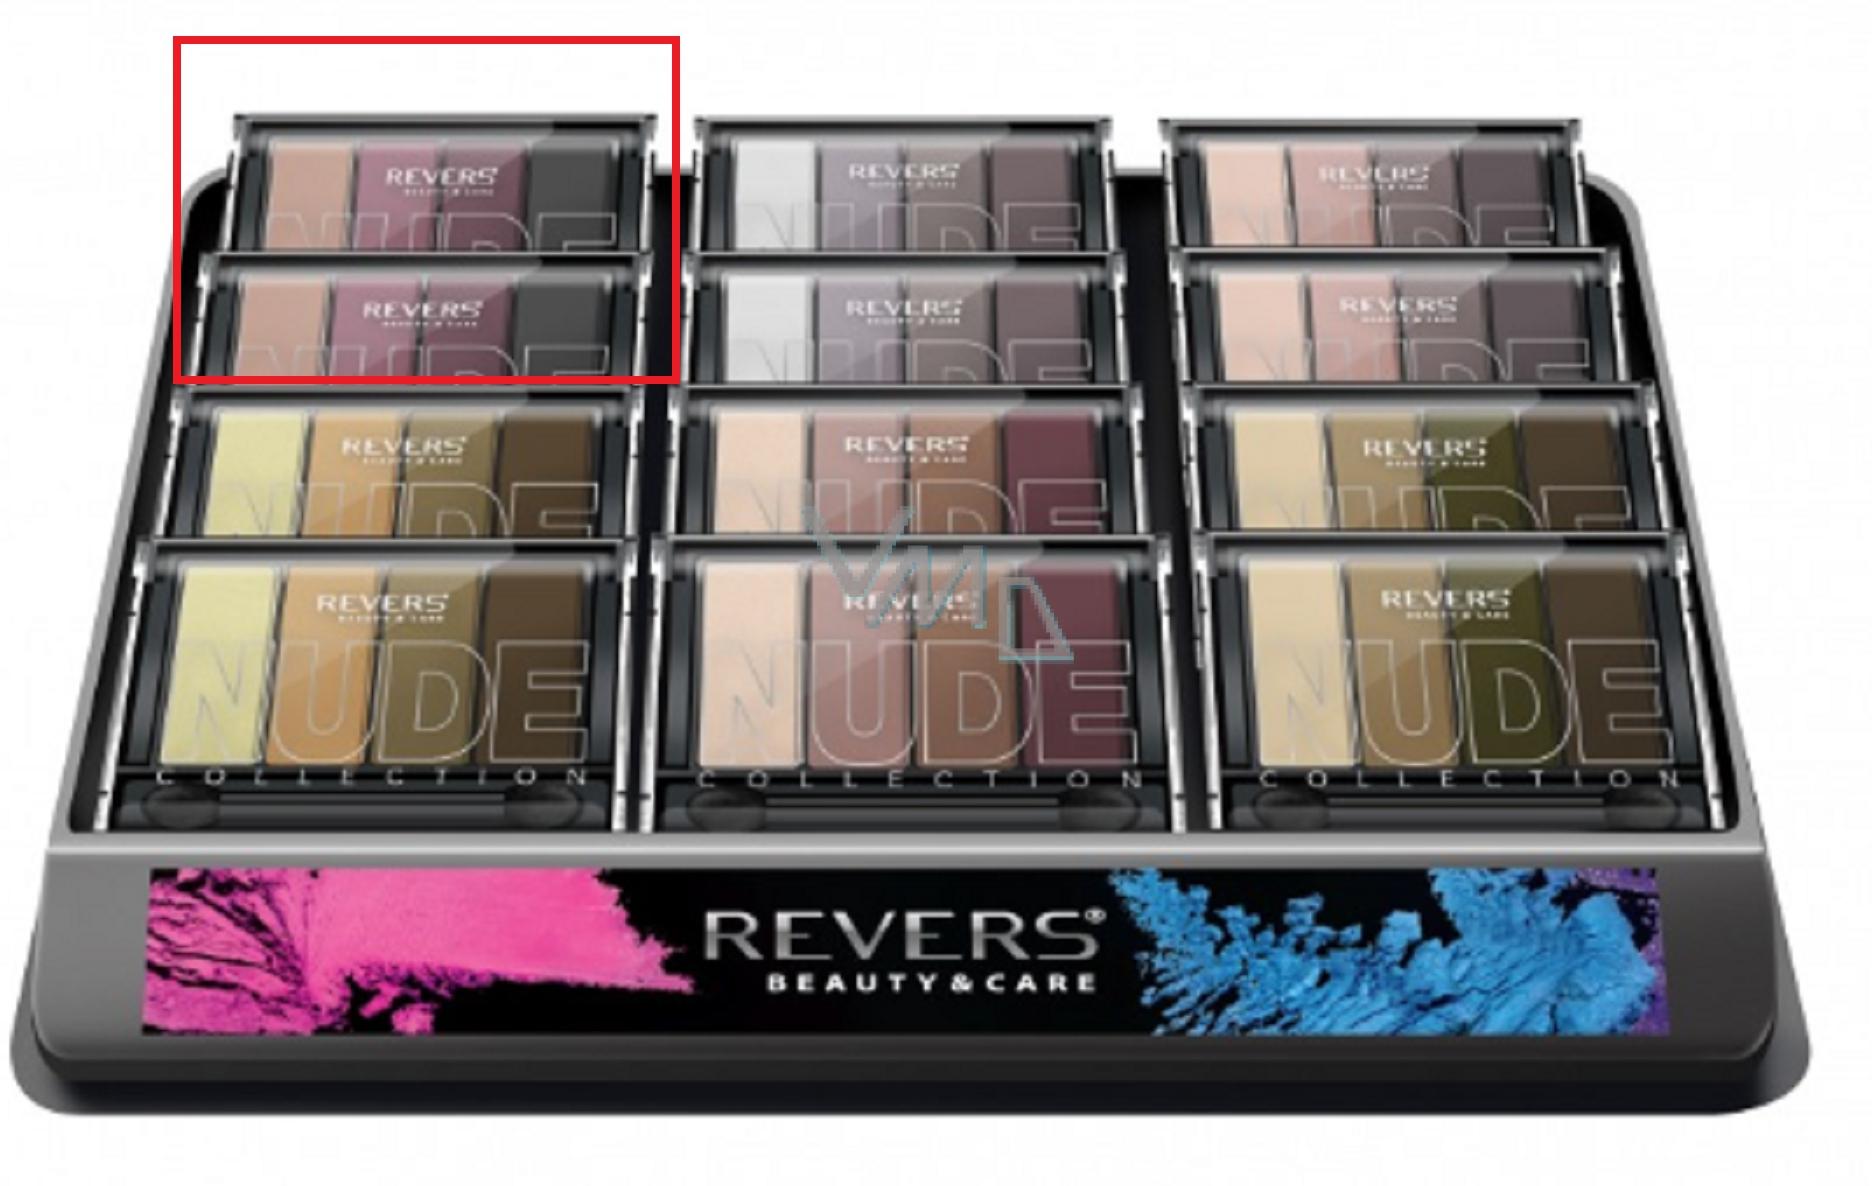 Revers Gallant Nude Eye Shadow oční stíny 12, 6 g